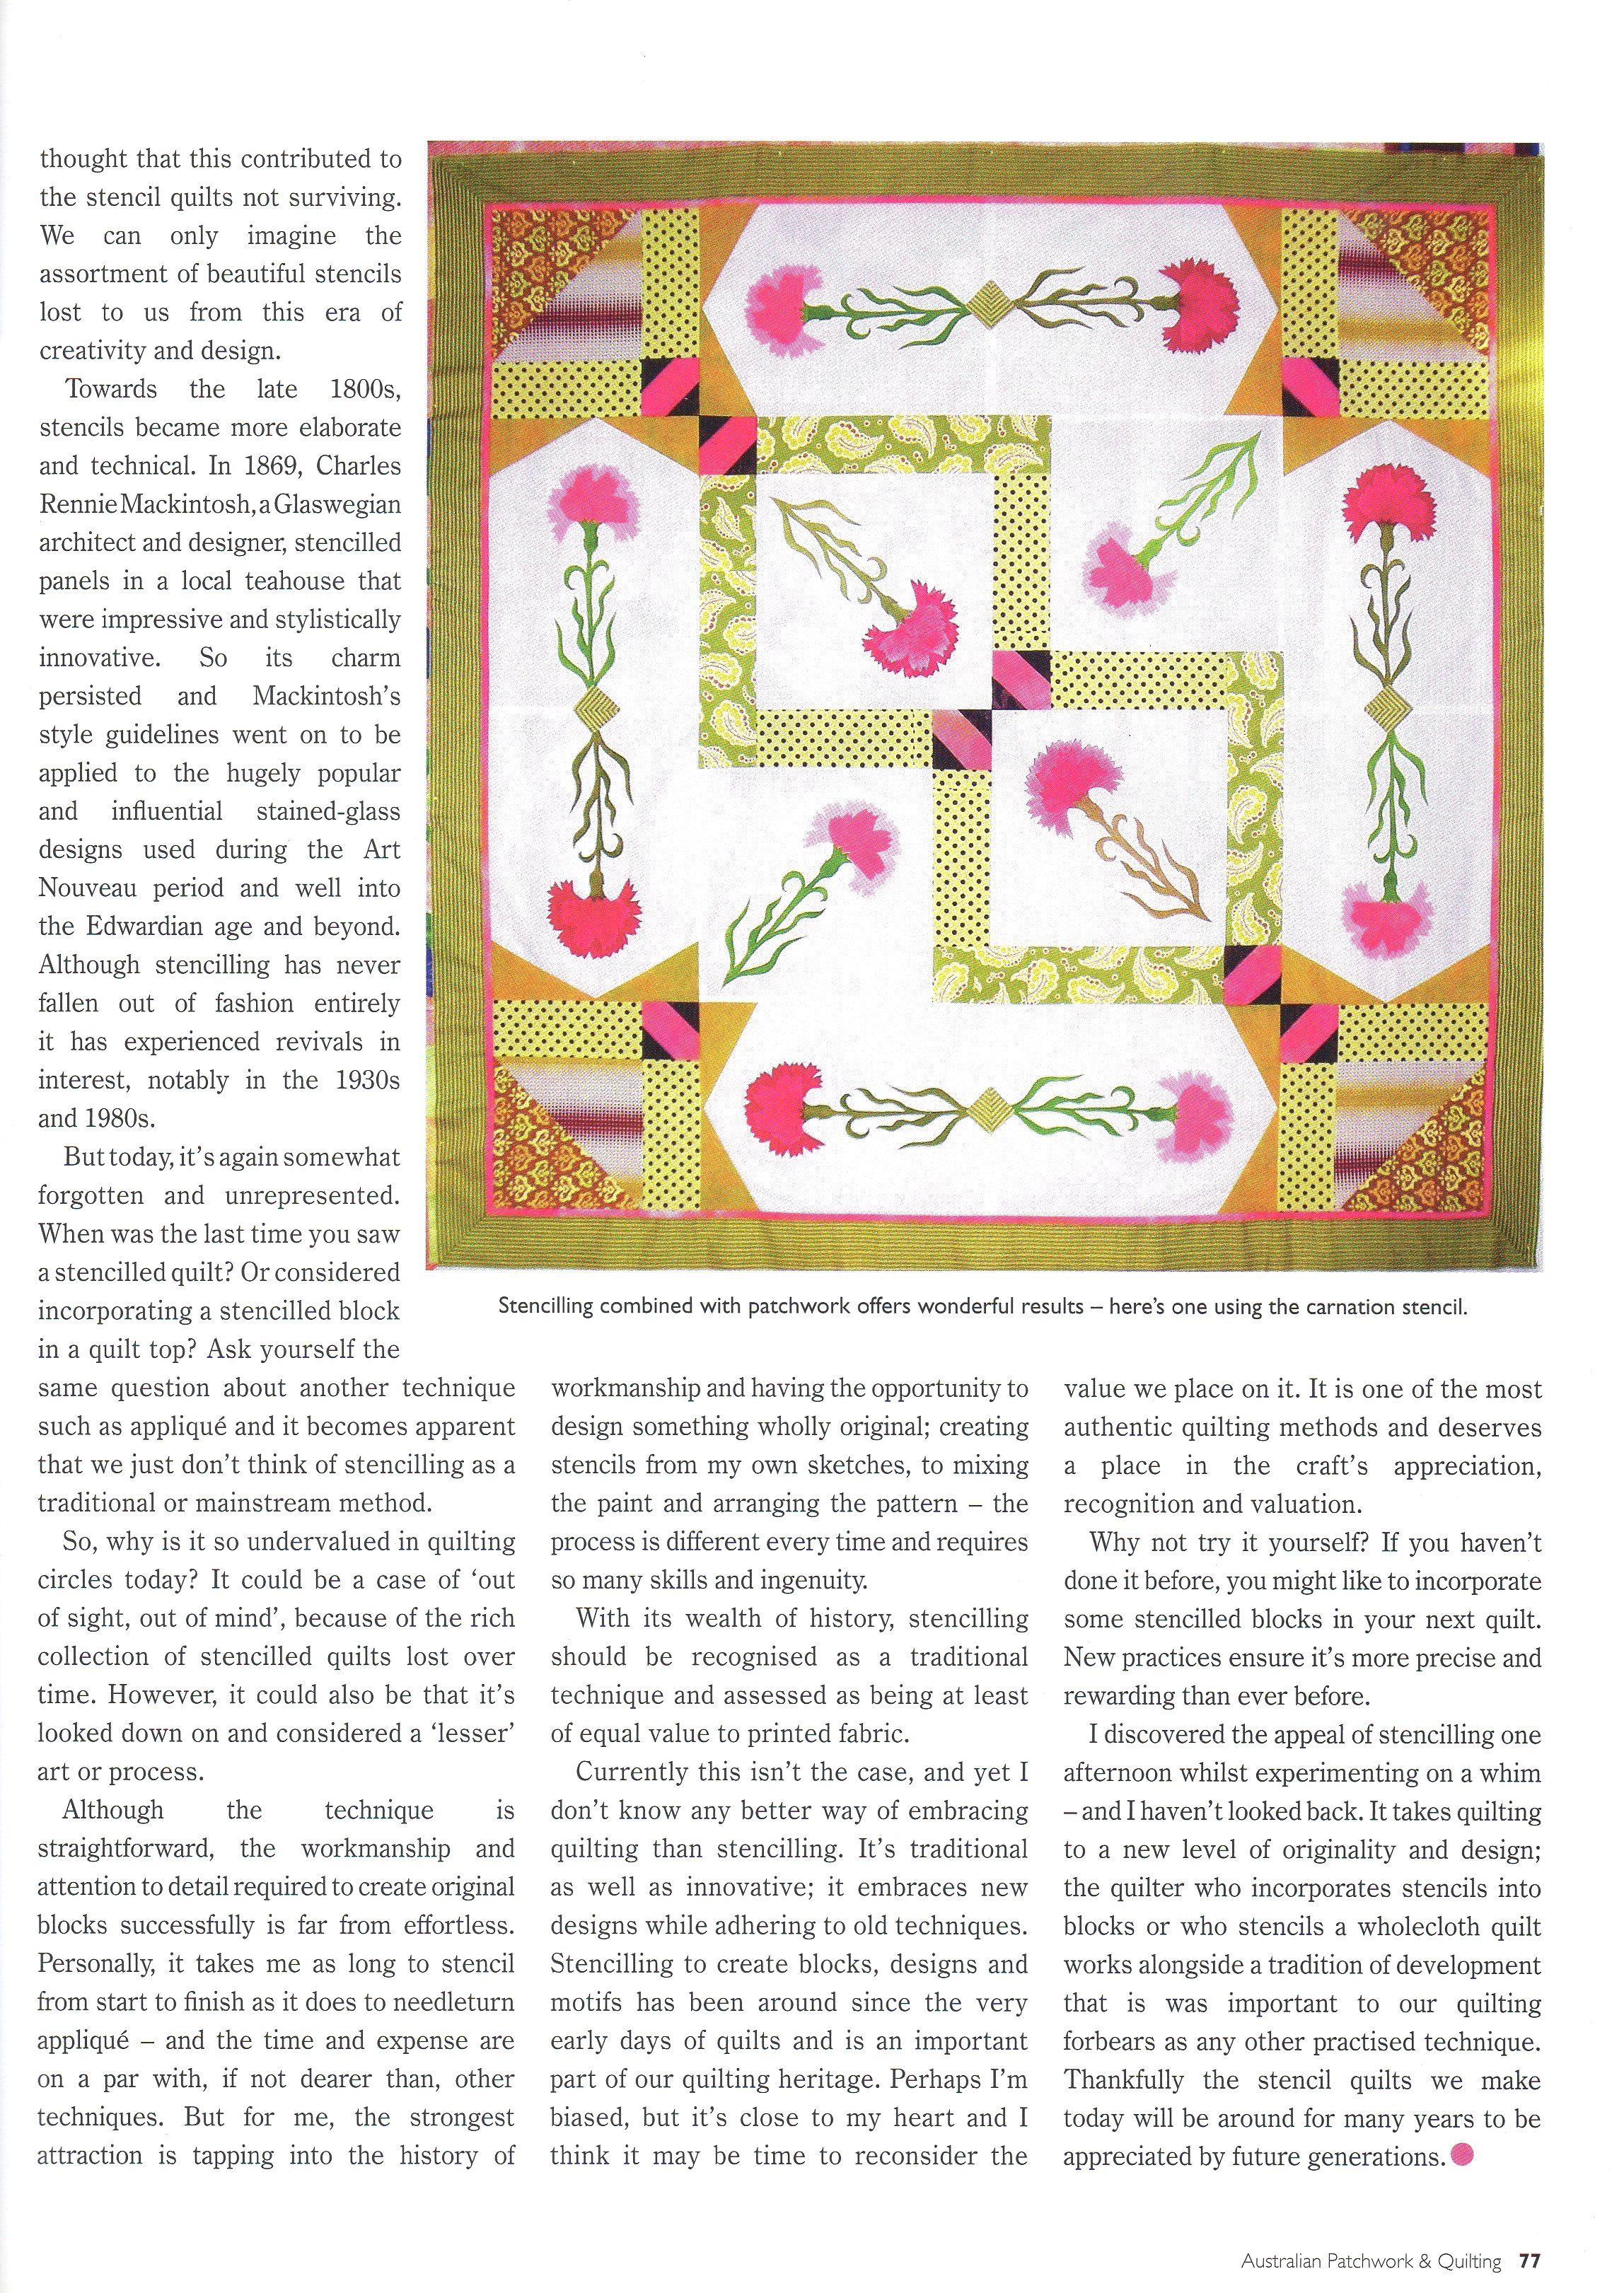 Aust. Patchwork & Quilting 2008 #7